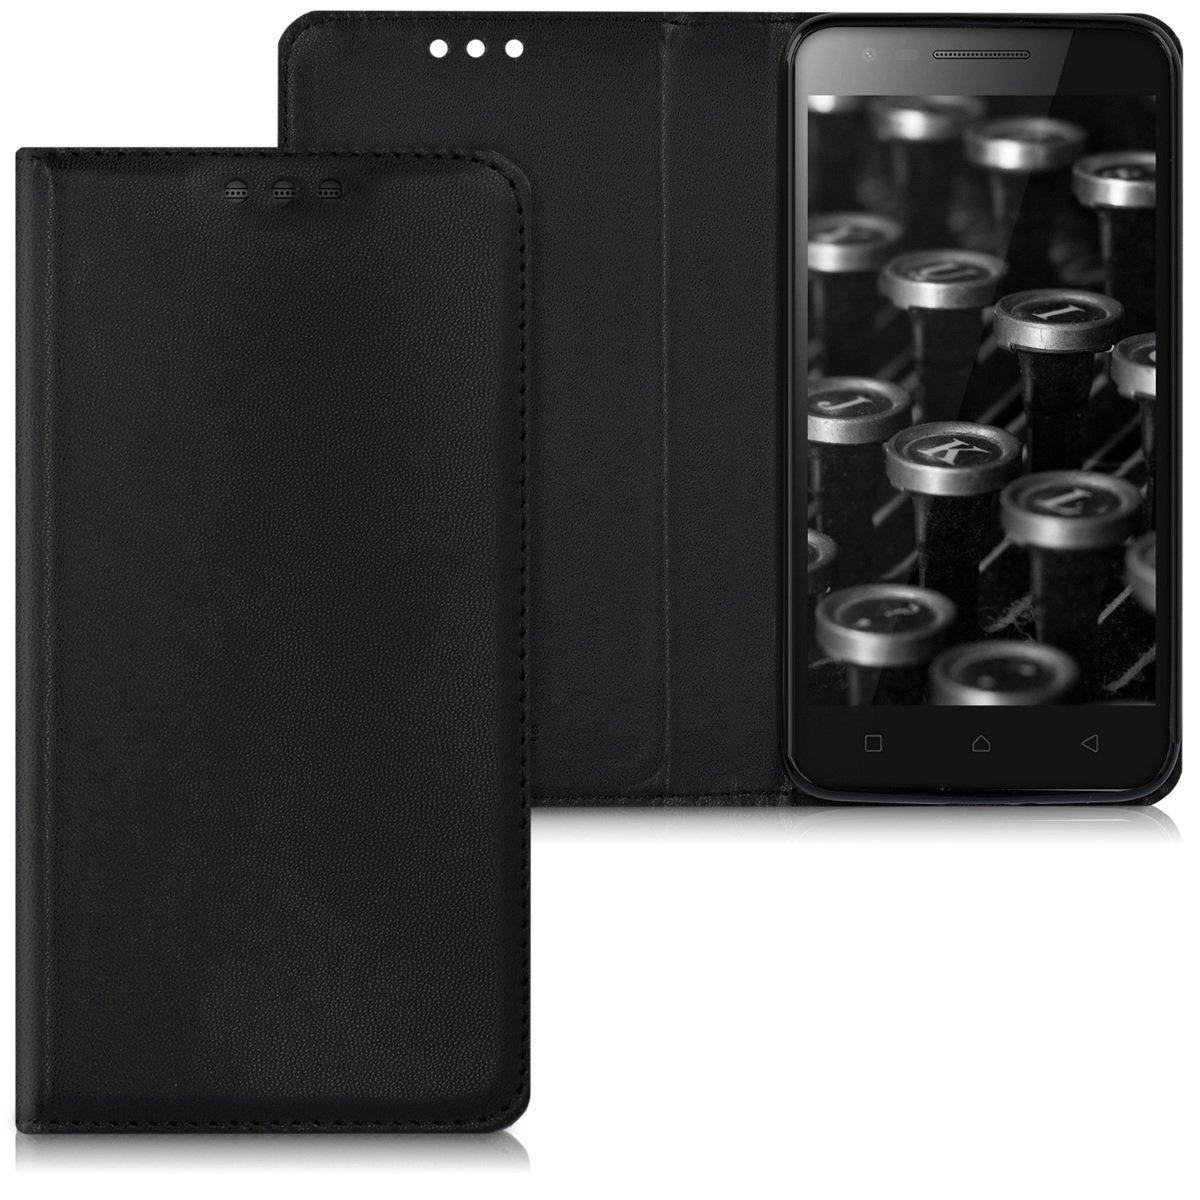 KW Flip Θήκη Lenovo C2 - Black (40502.01)